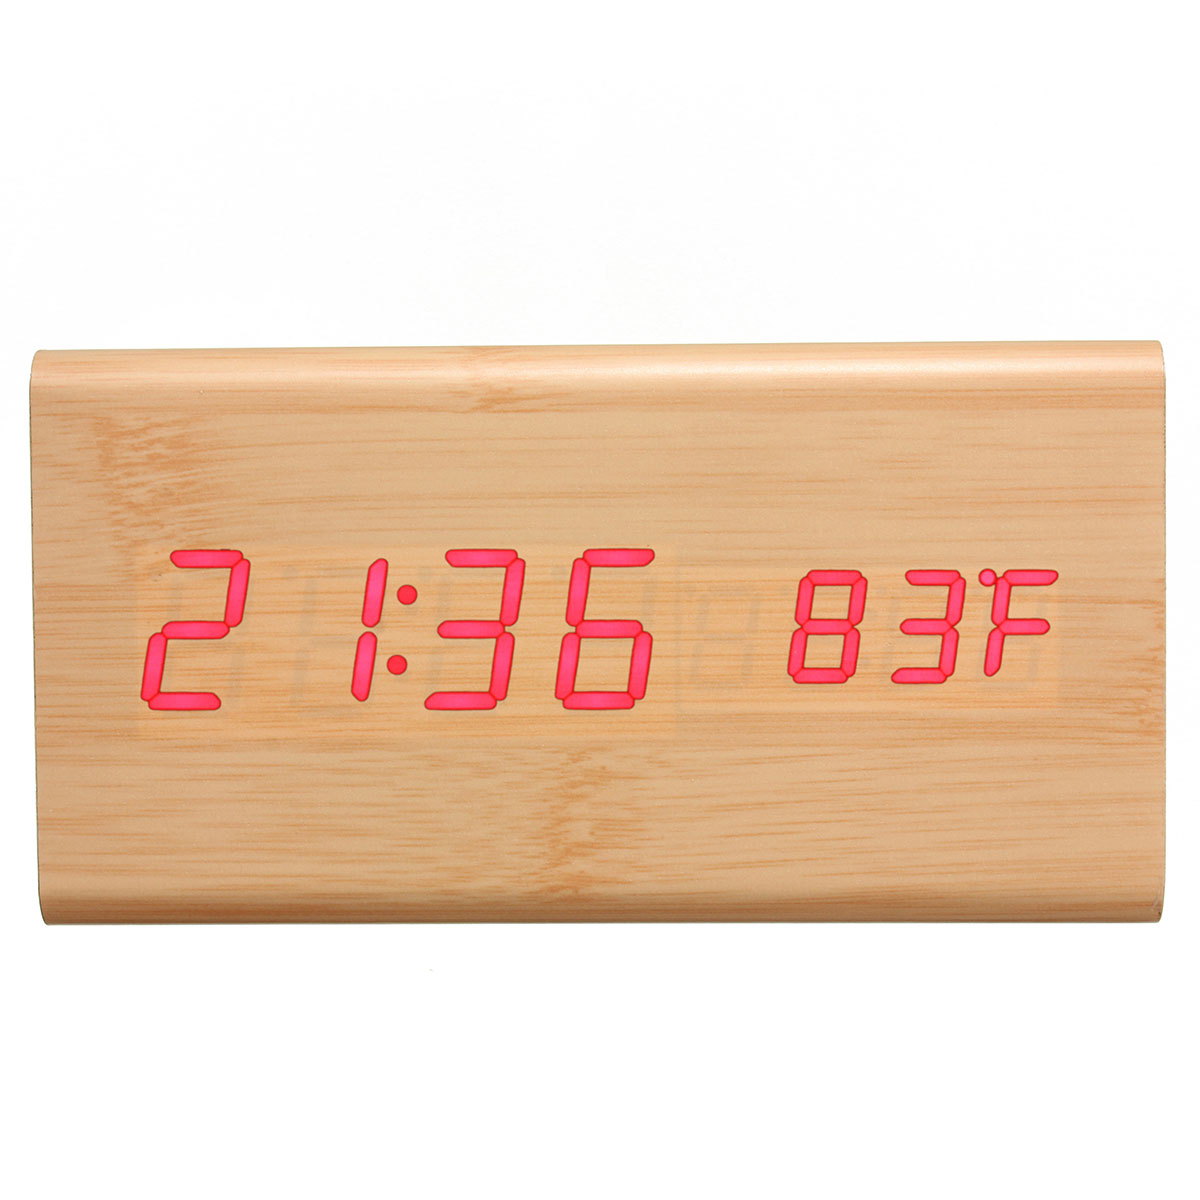 digitaler led wecker thermometer kalender wooden holz alarm temperatur uhr datum lazada malaysia. Black Bedroom Furniture Sets. Home Design Ideas